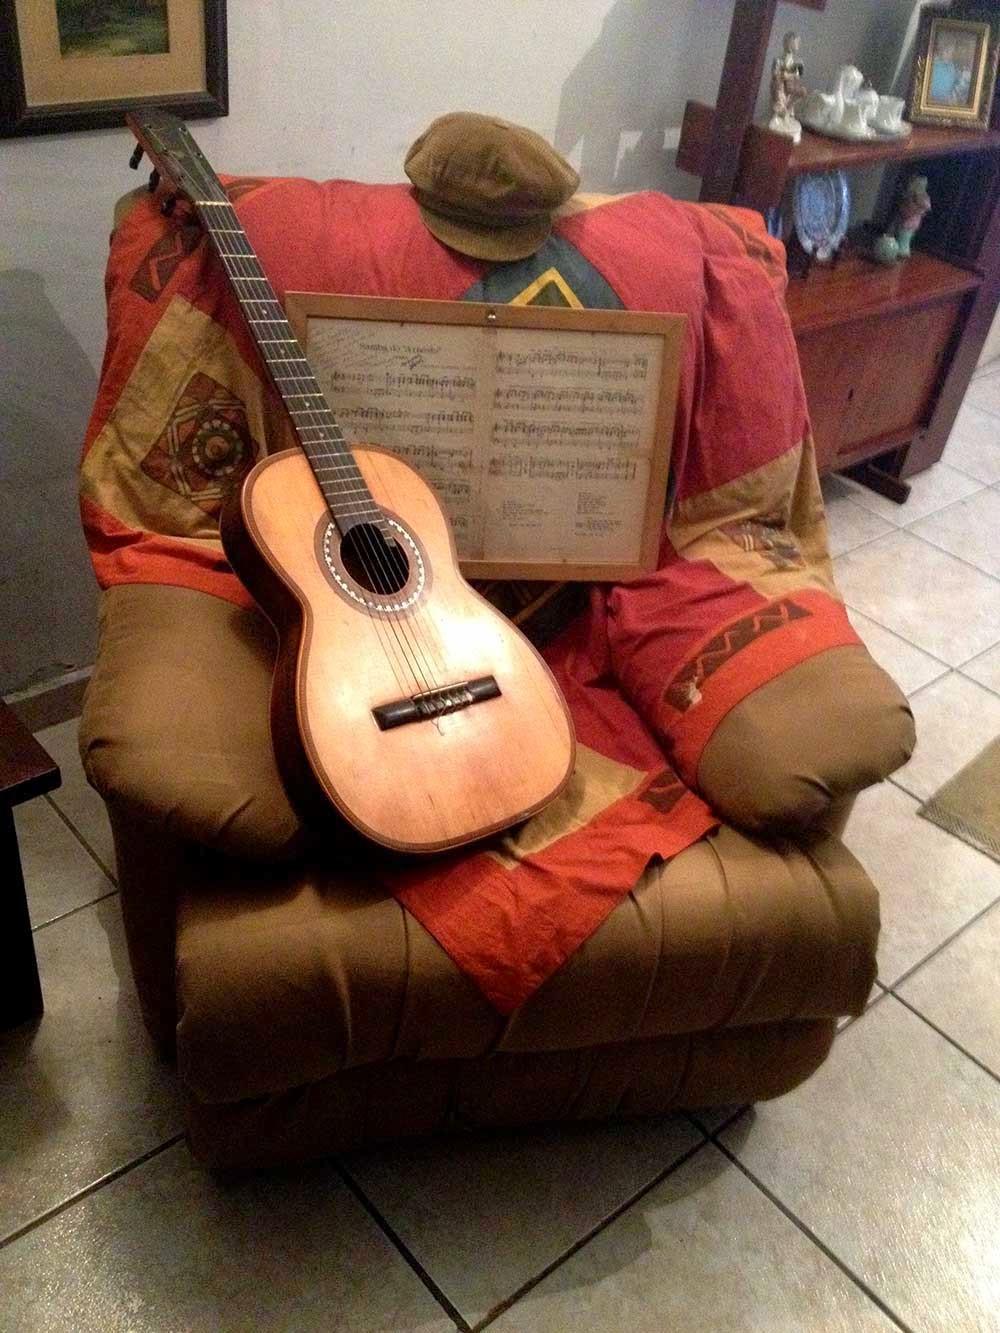 Adoniran Barbosa, Ernesto Paulelli, Samba do Arnesto, samba, samba paulista, Música Popular Brasileira, Demônios da Garoa